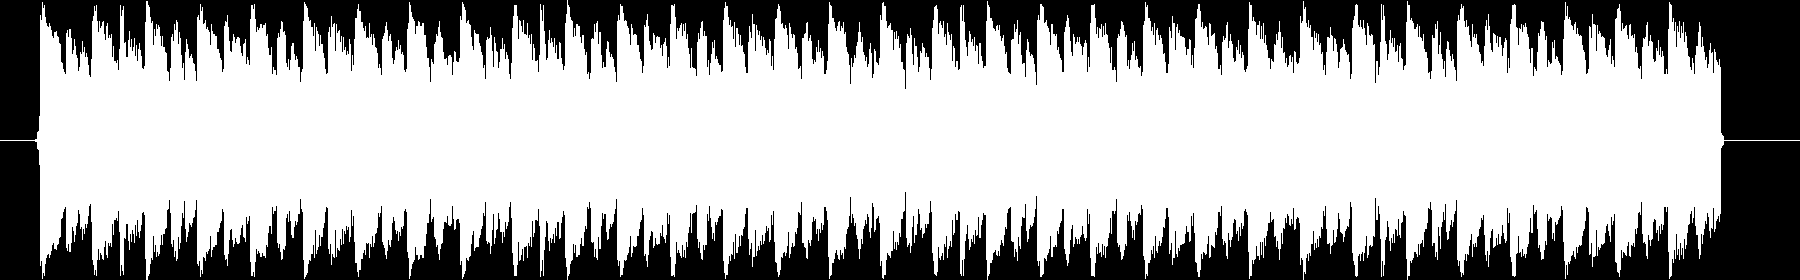 Velvet Carbon Techno audio waveform